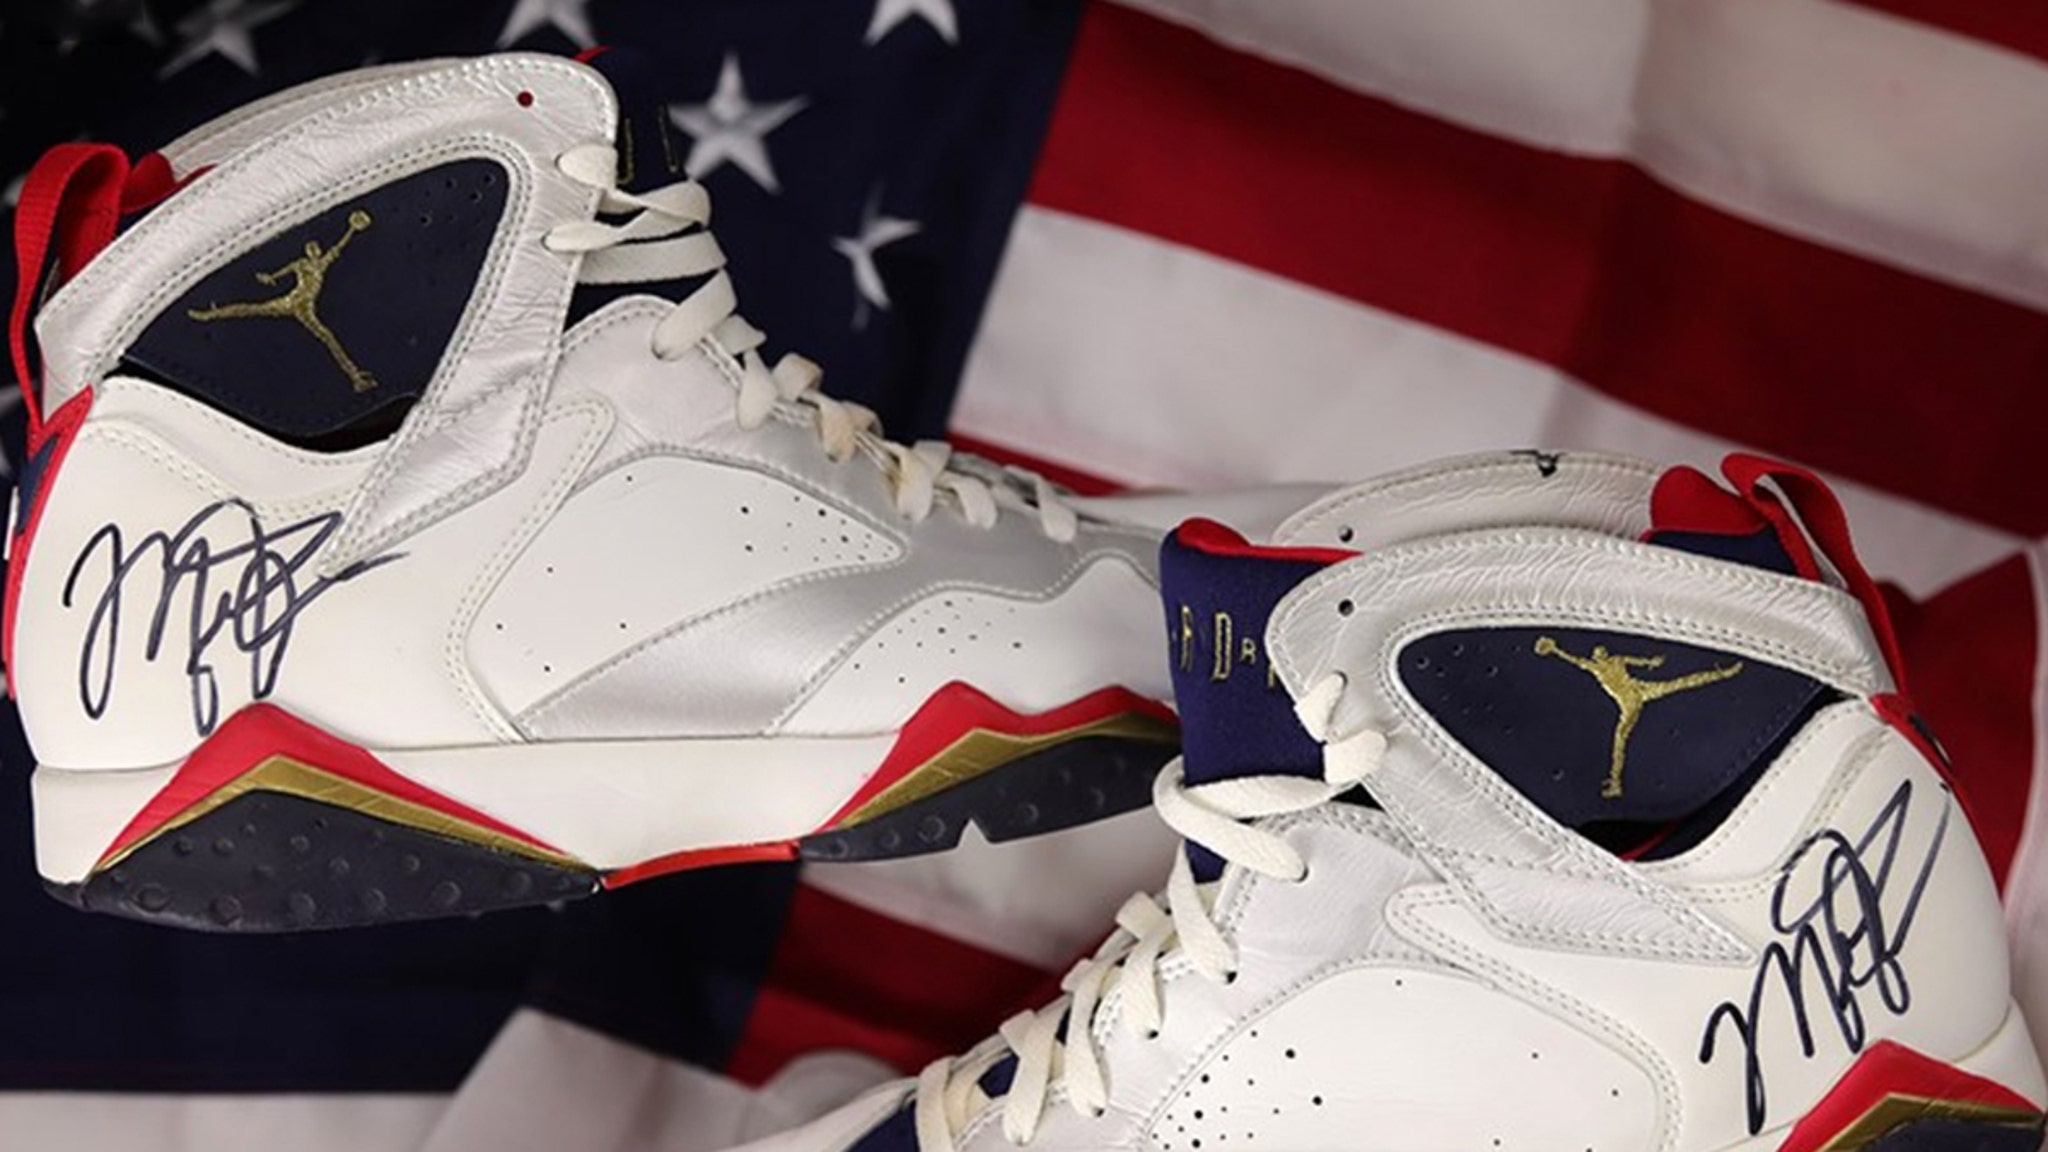 Michael Jordan Autographed, Game-Worn Dream Team Kicks On Auction Block